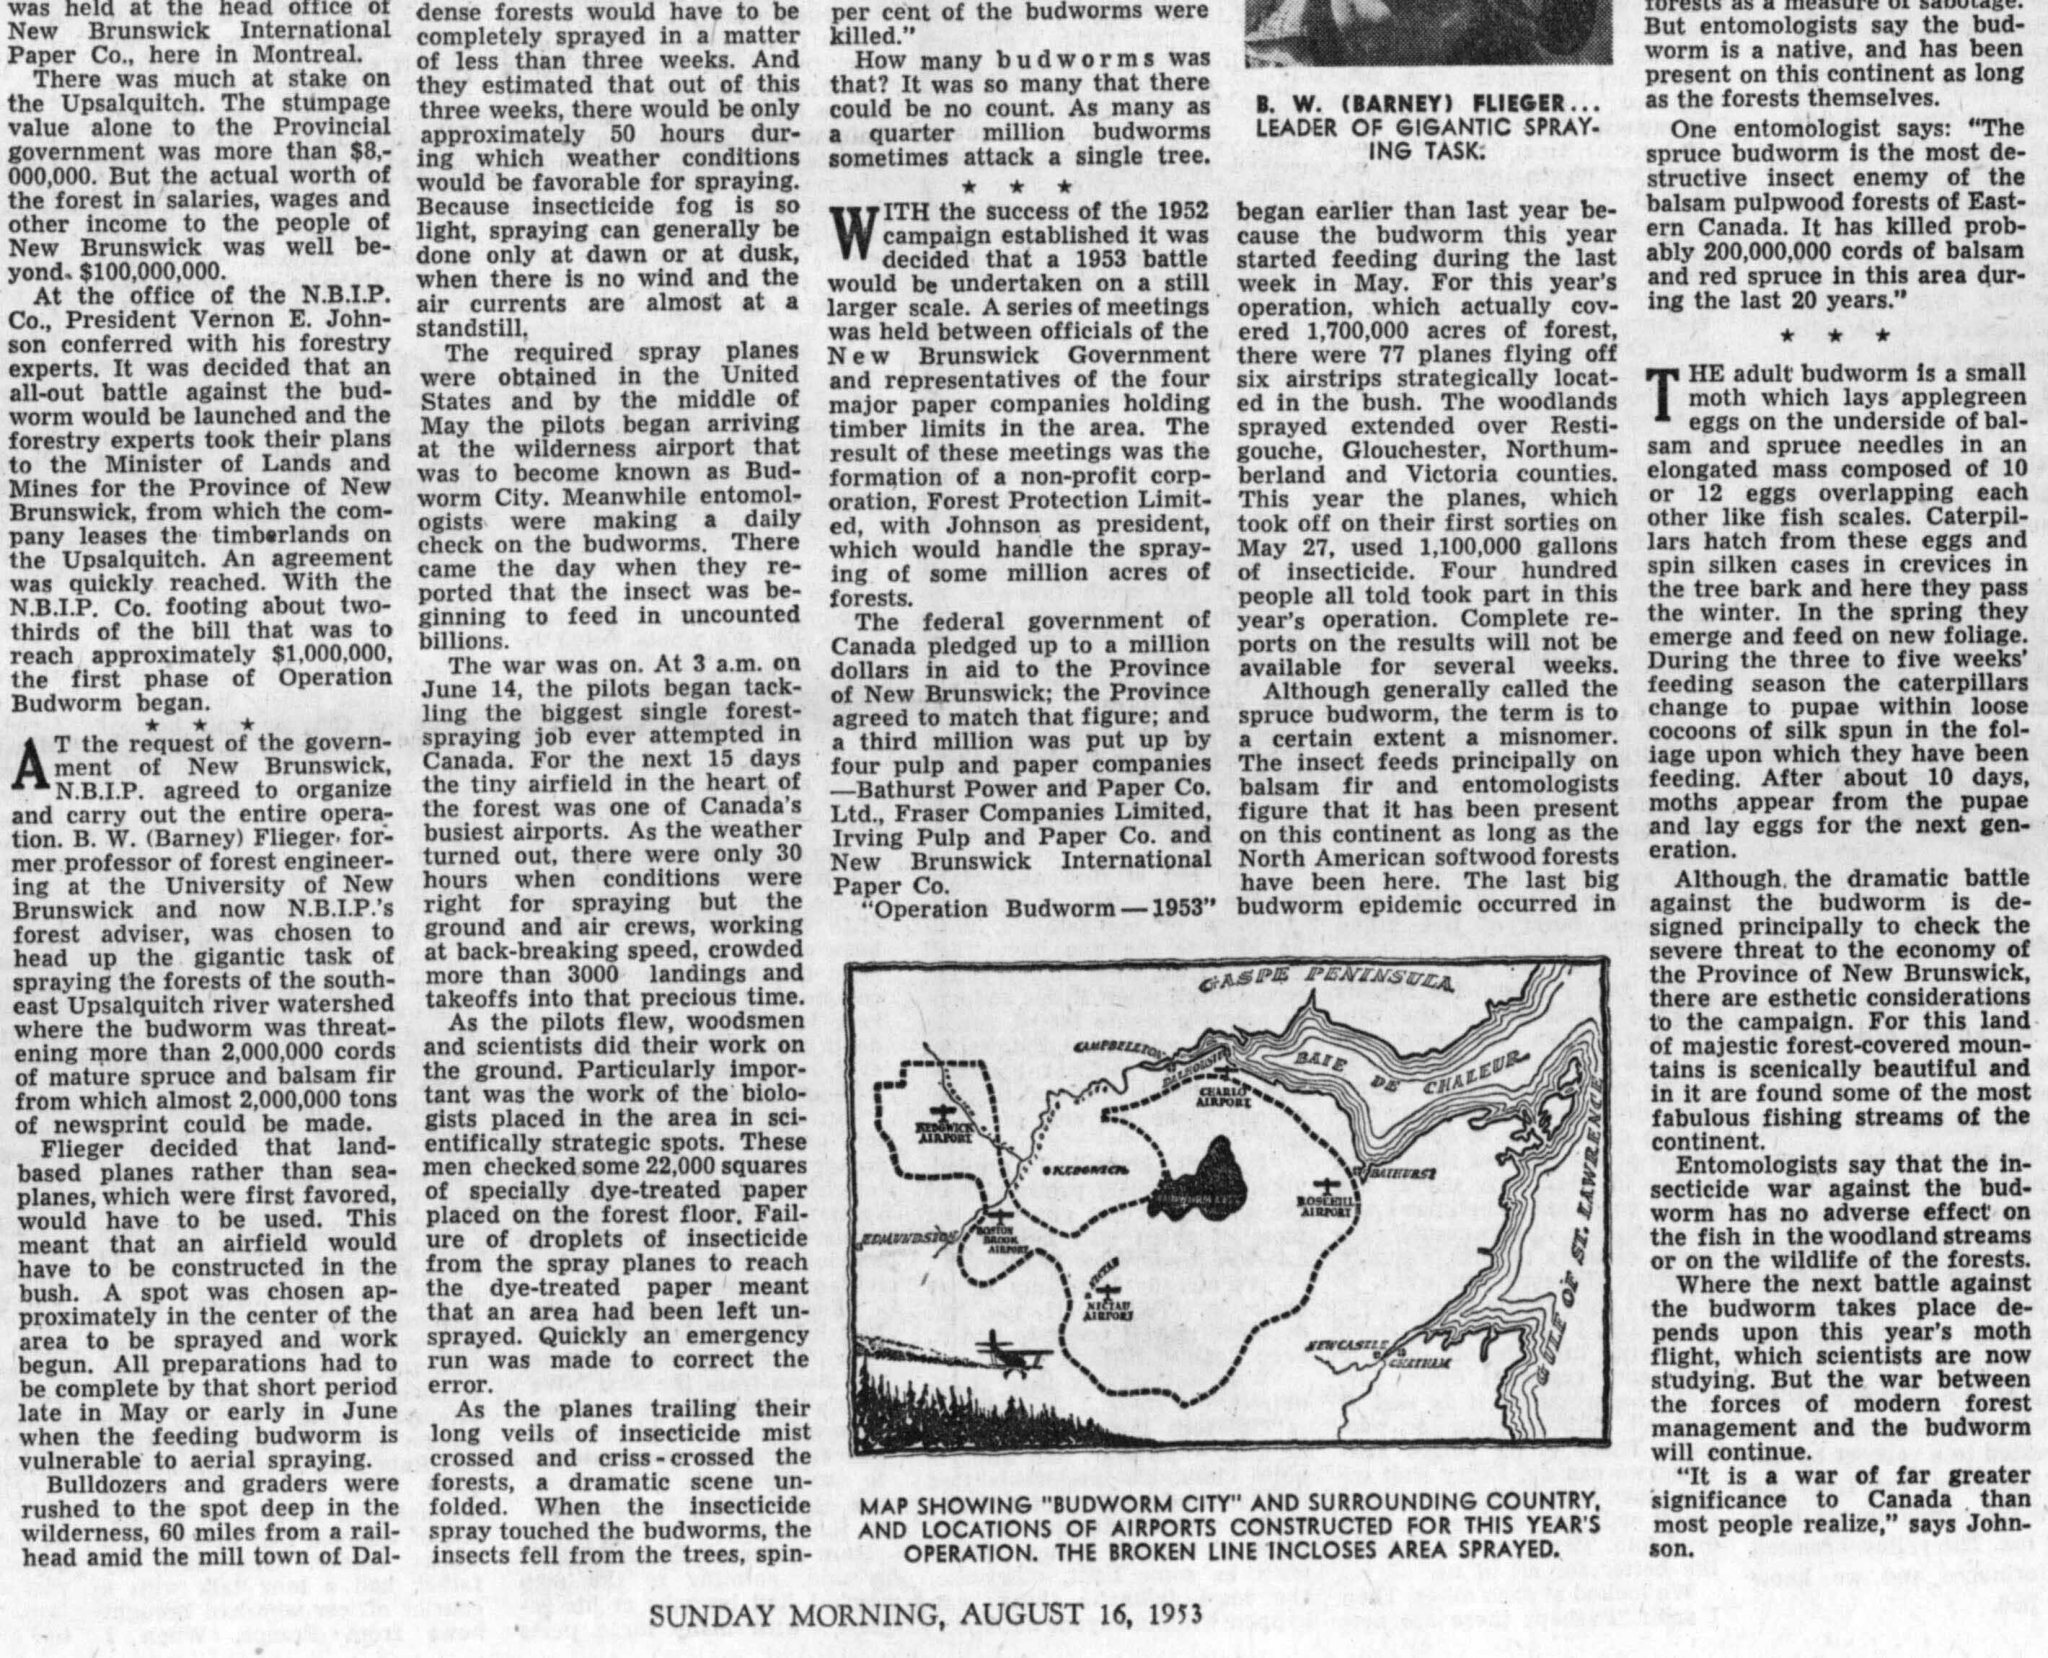 x-St Louis Post-Dispatch_16Aug1953-3